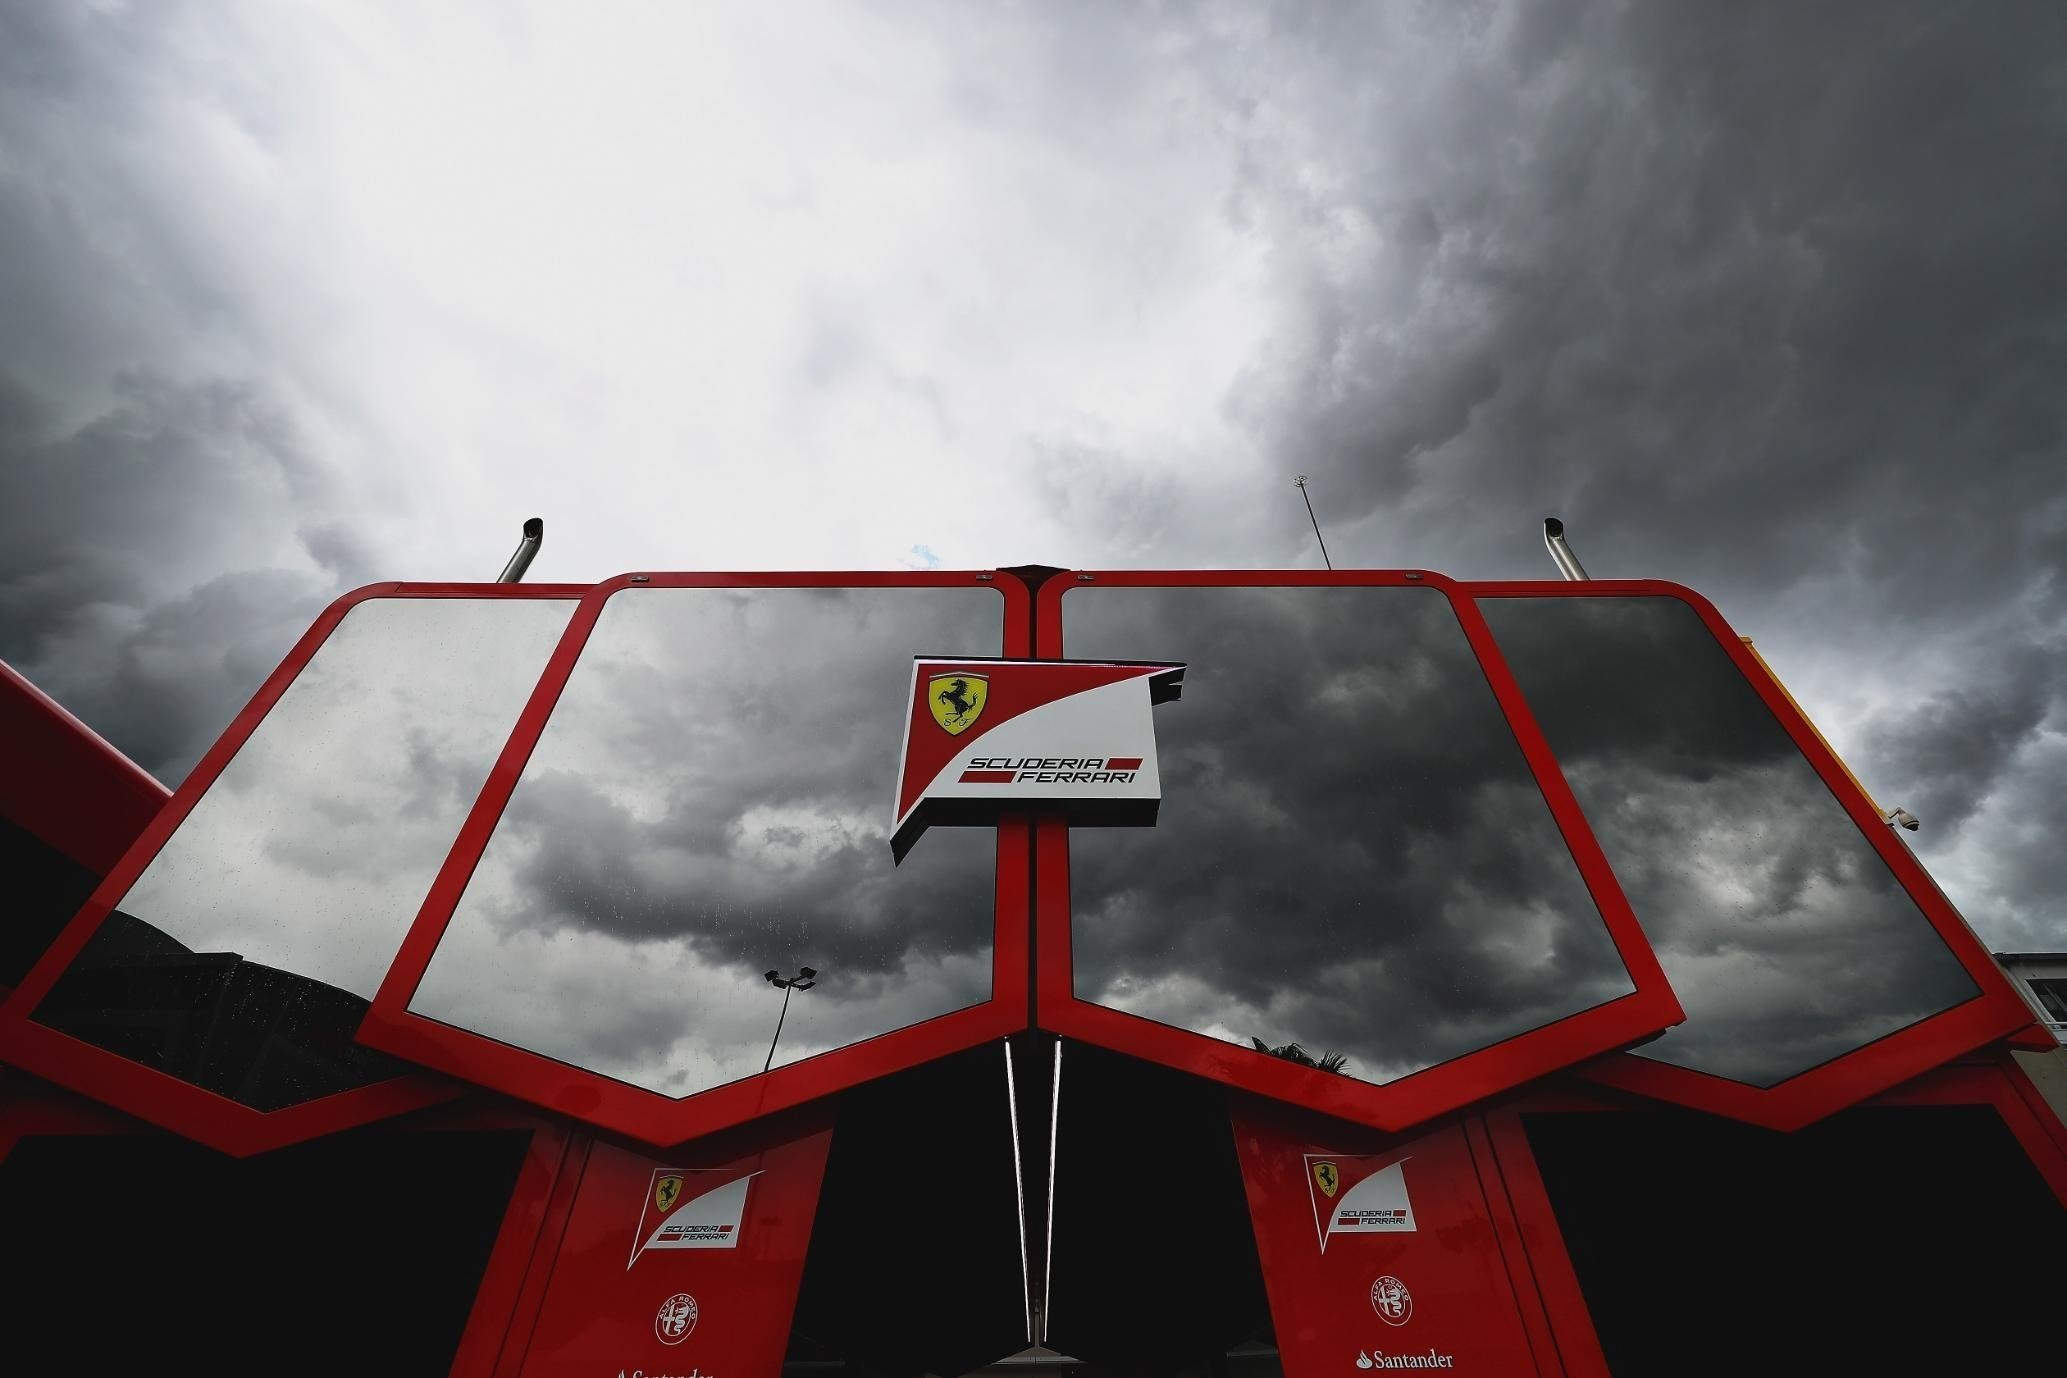 Williams braced for Silverstone struggle